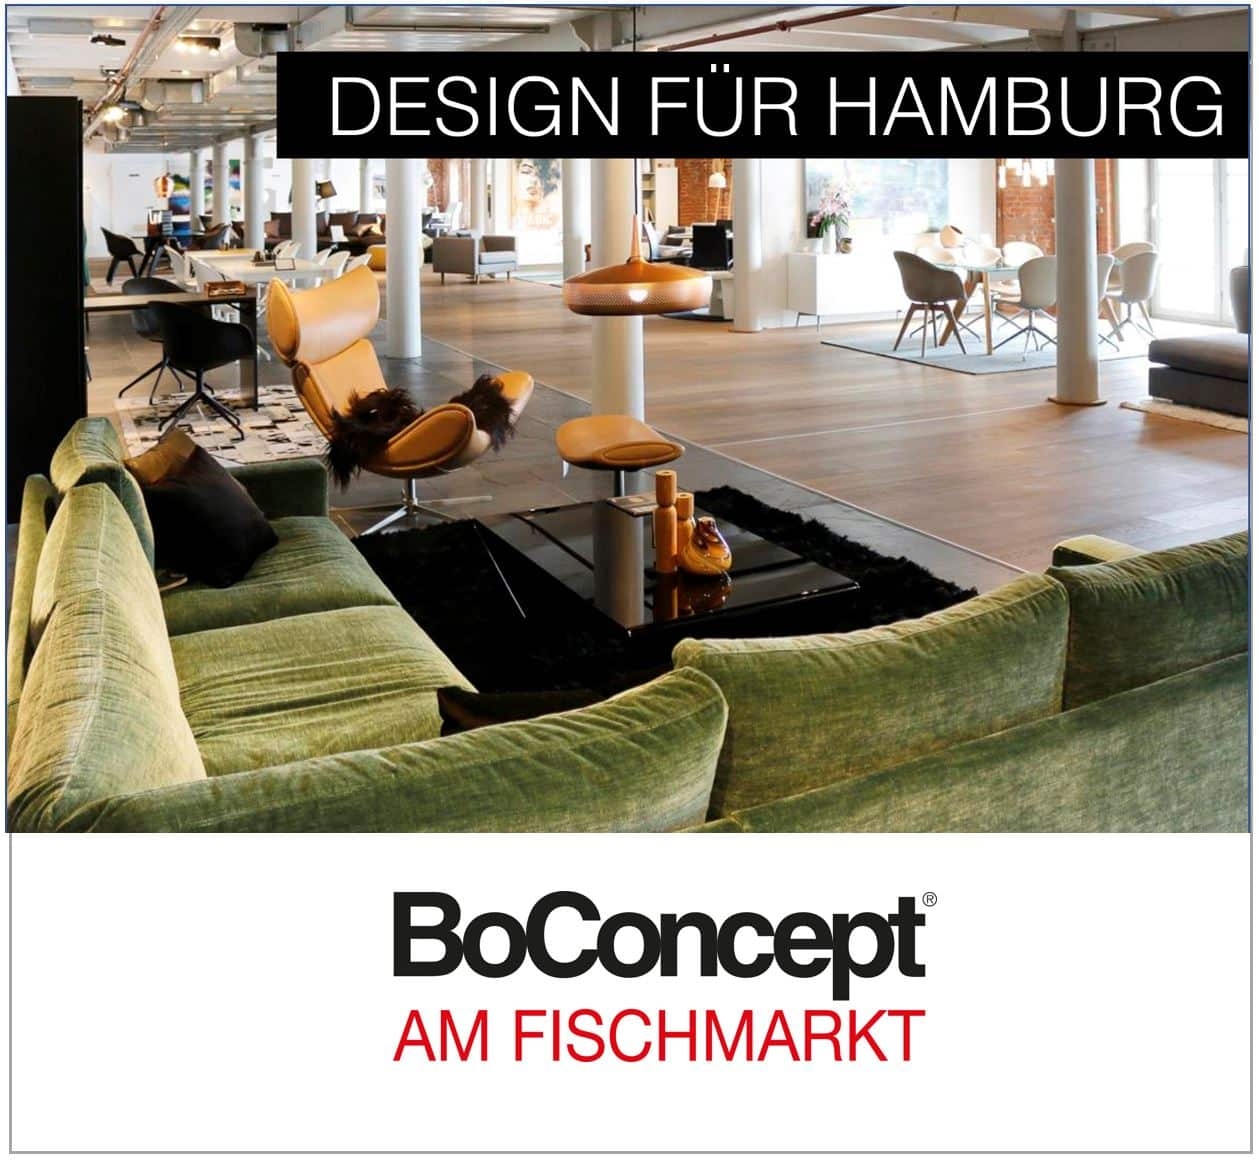 Boconcept Hamburg stores hamburg boconcept experience hamburg am fischmarkt